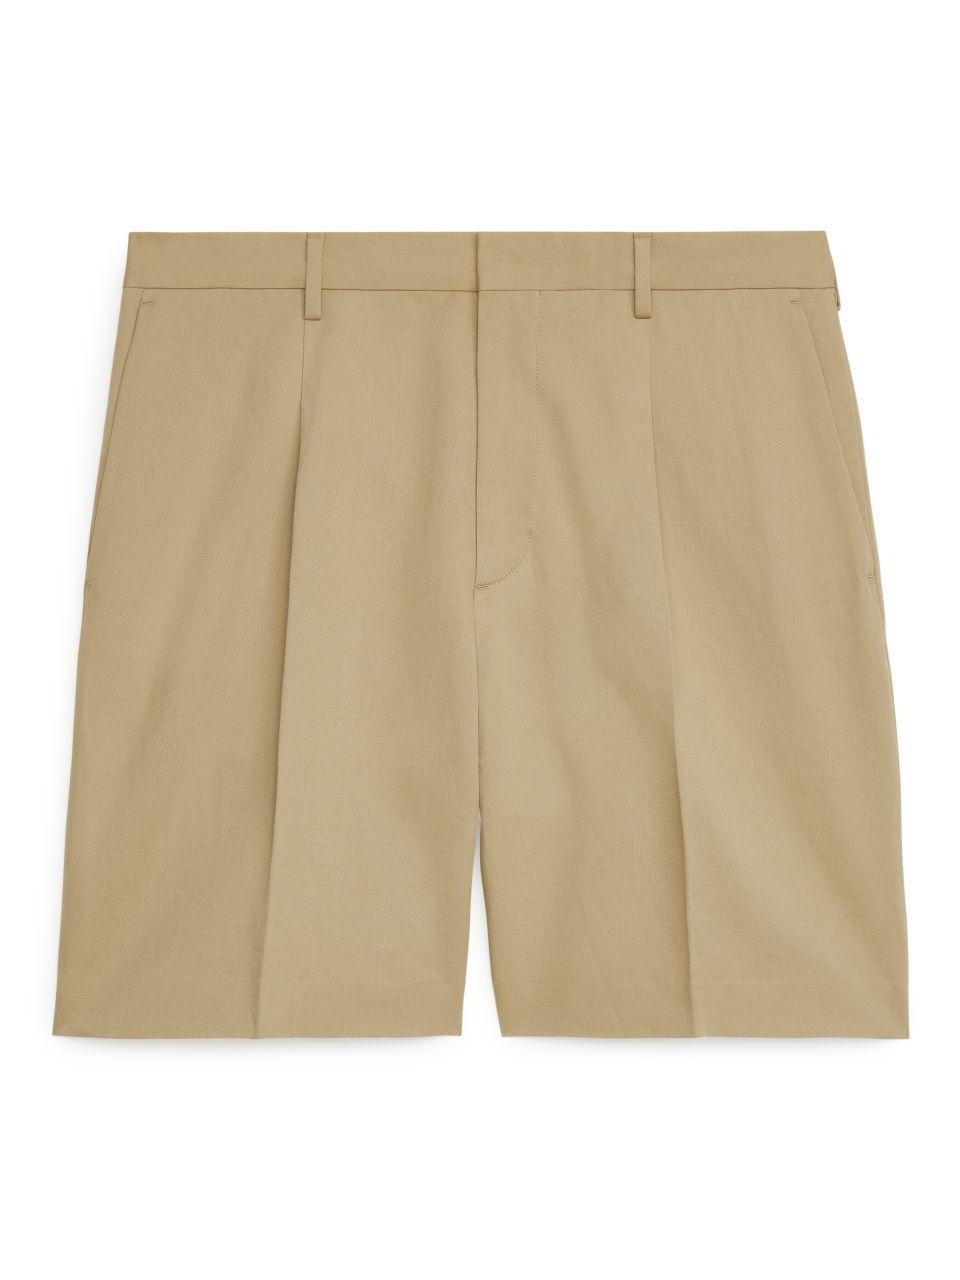 Loose Fit Linen Shorts - Beige